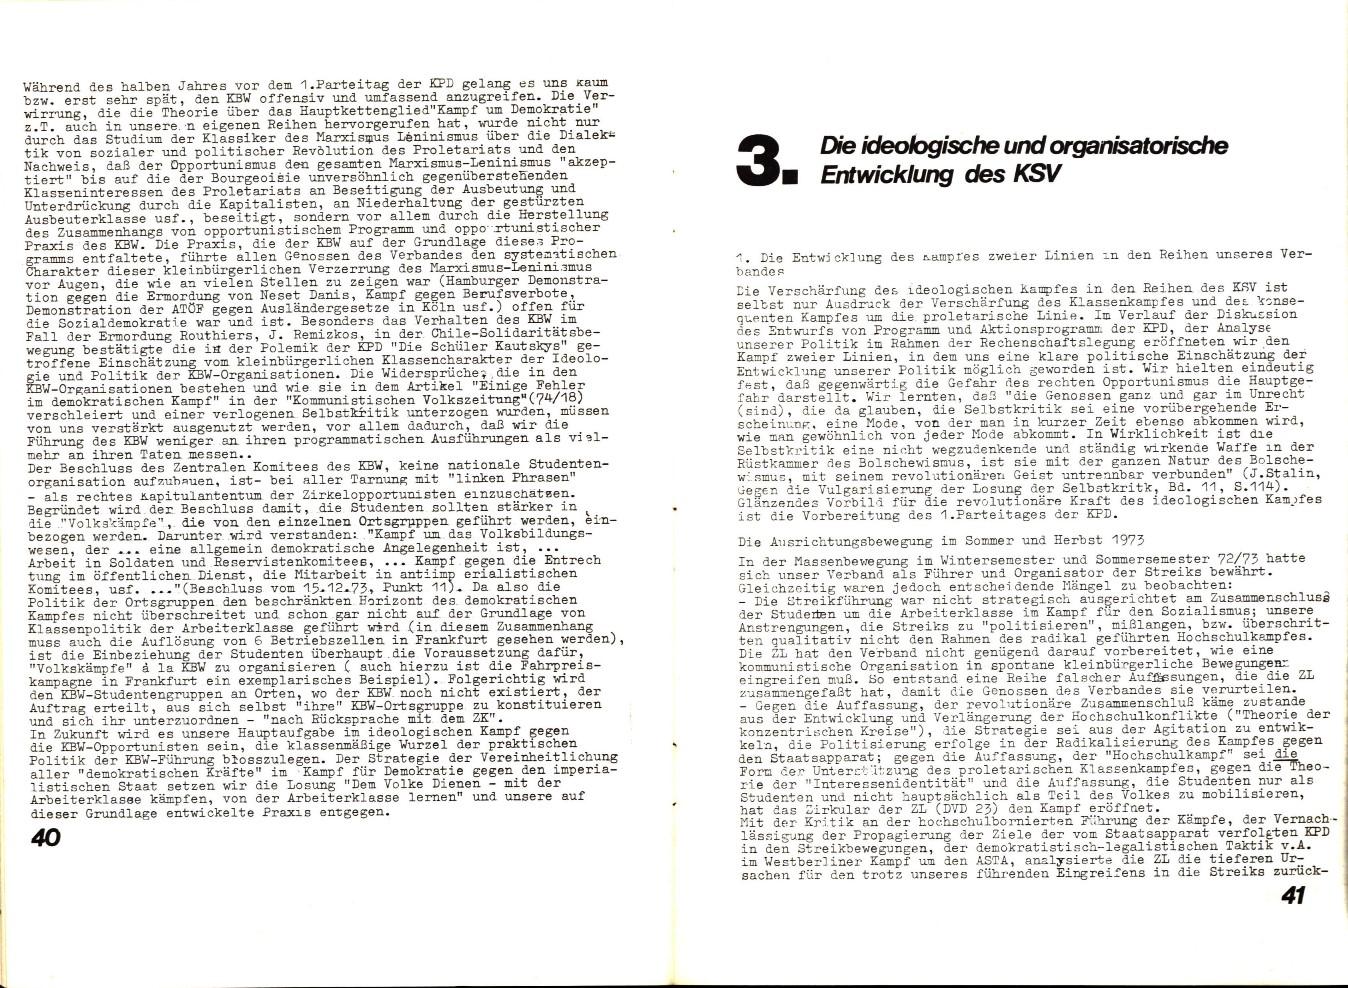 KSV_1974_Rechenschaftsbericht_22